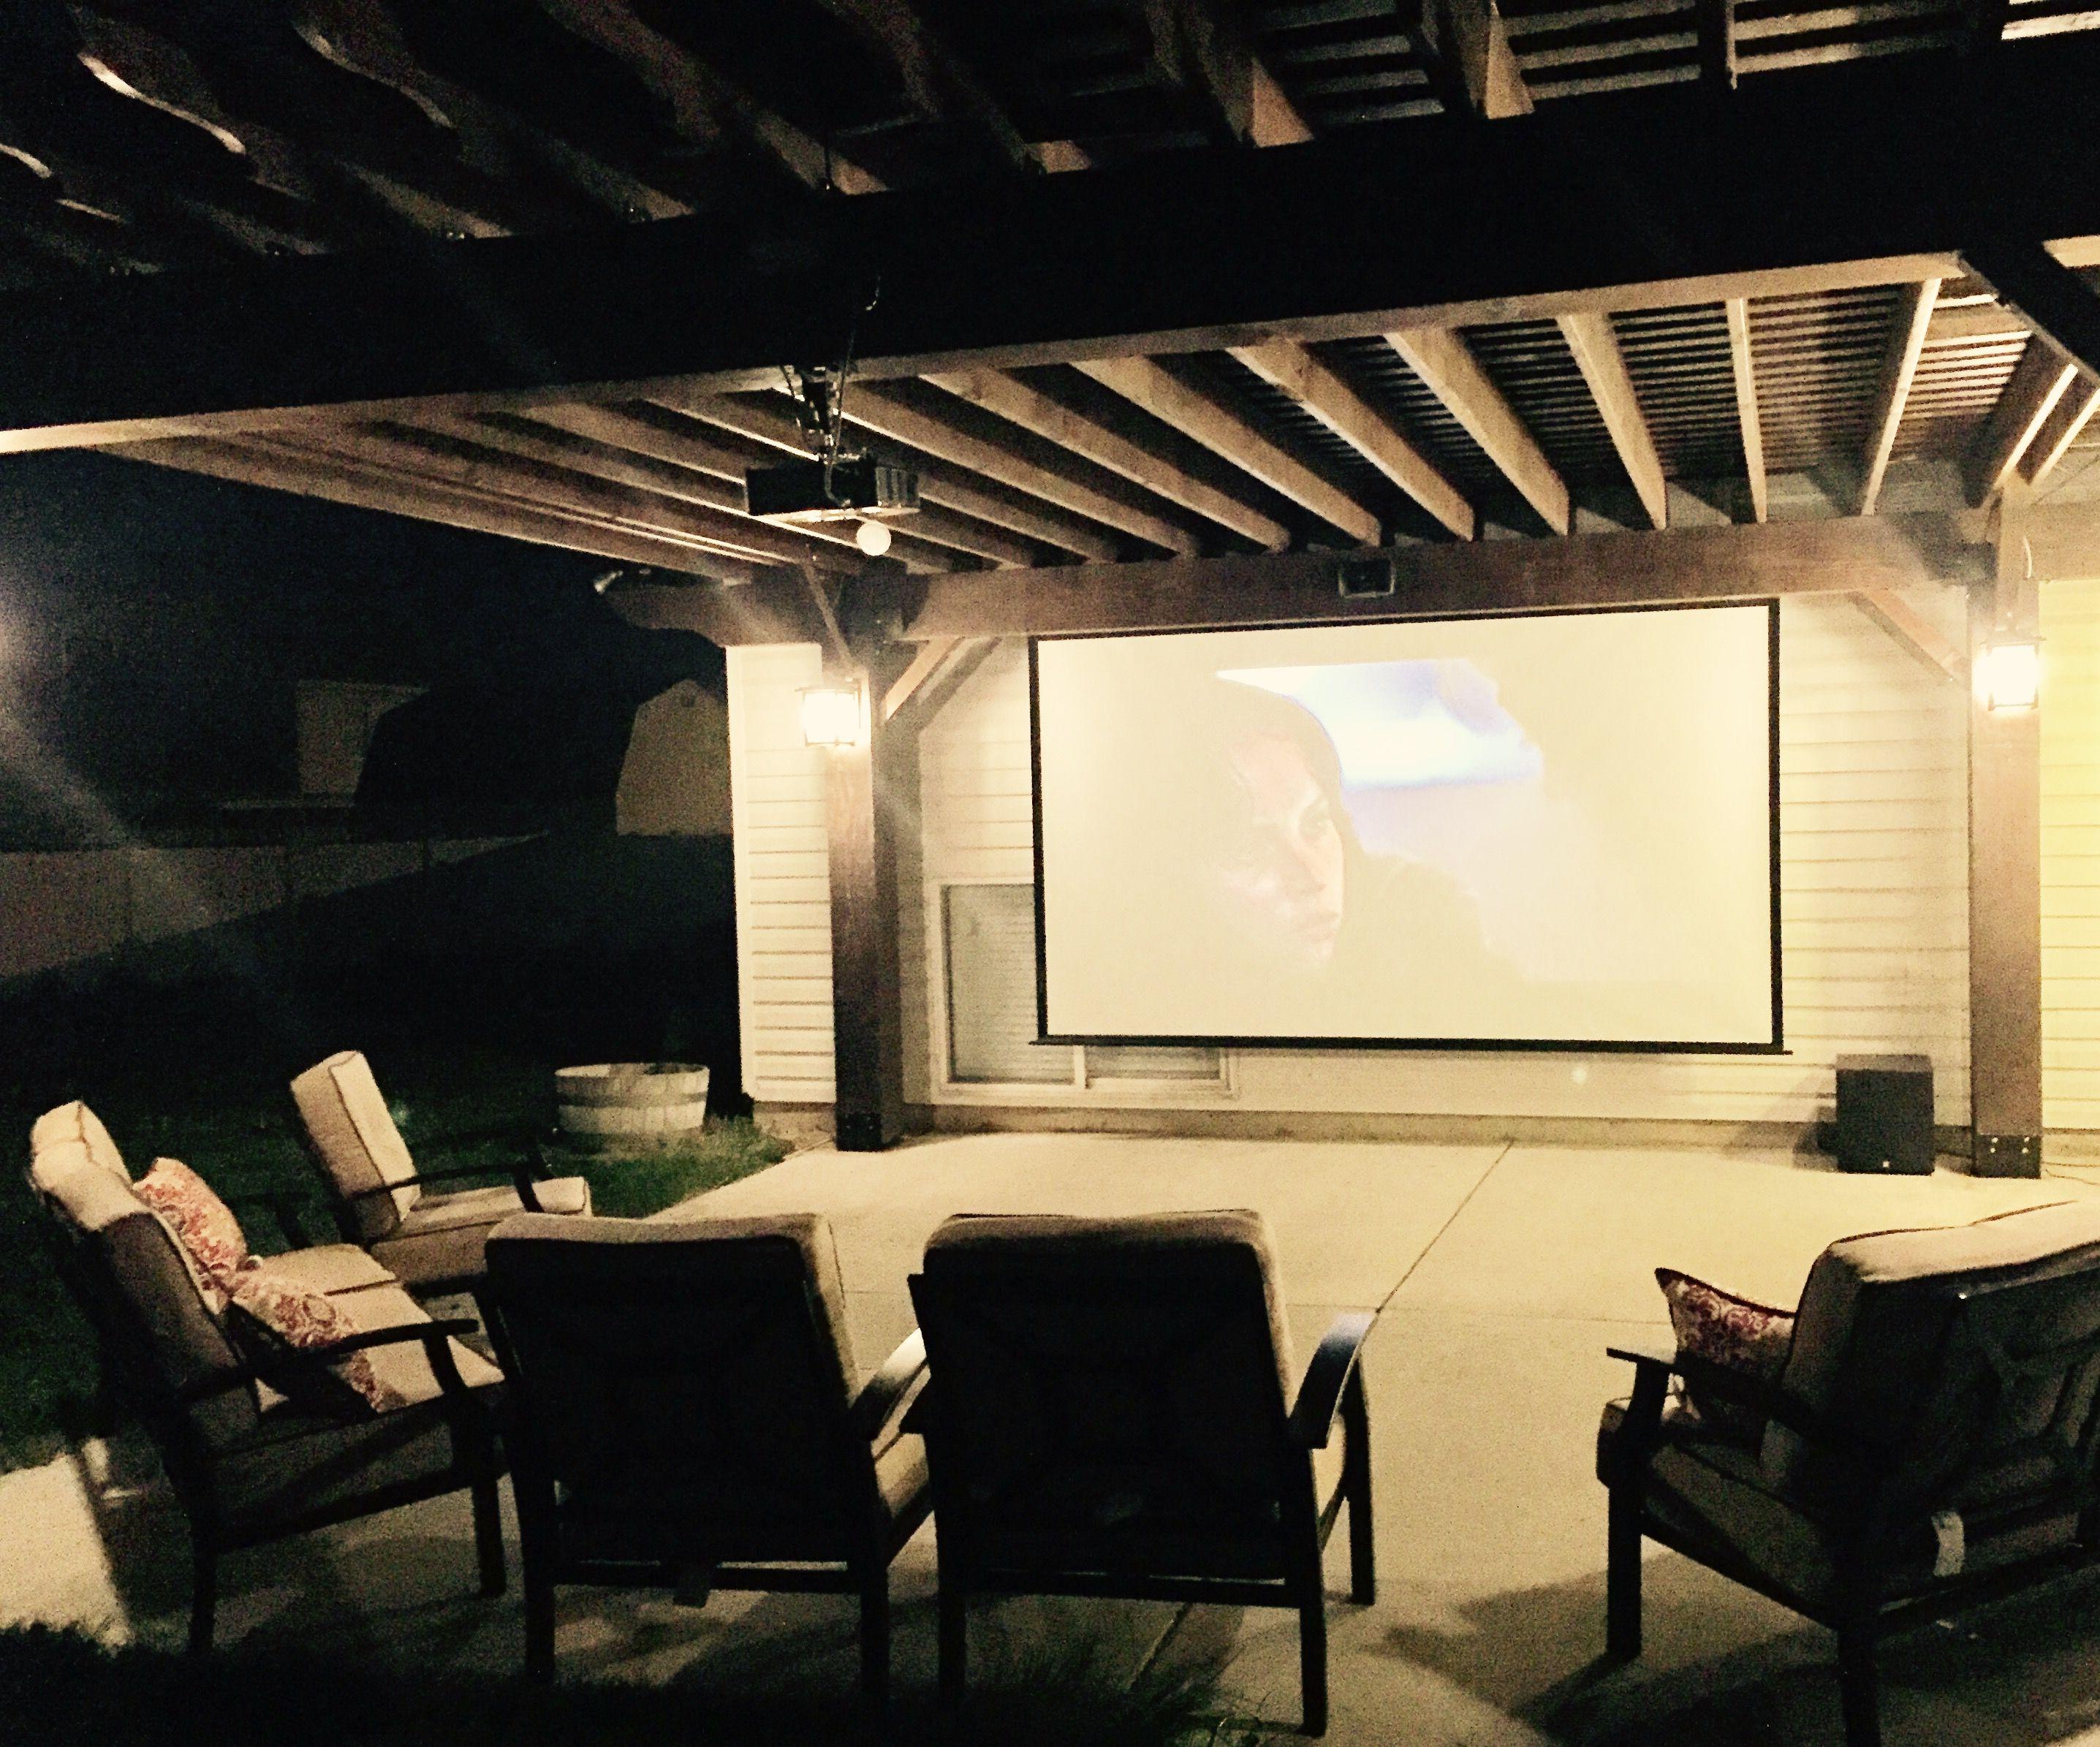 DIY Pergola, Pergola post lighting, optoma projector, 150